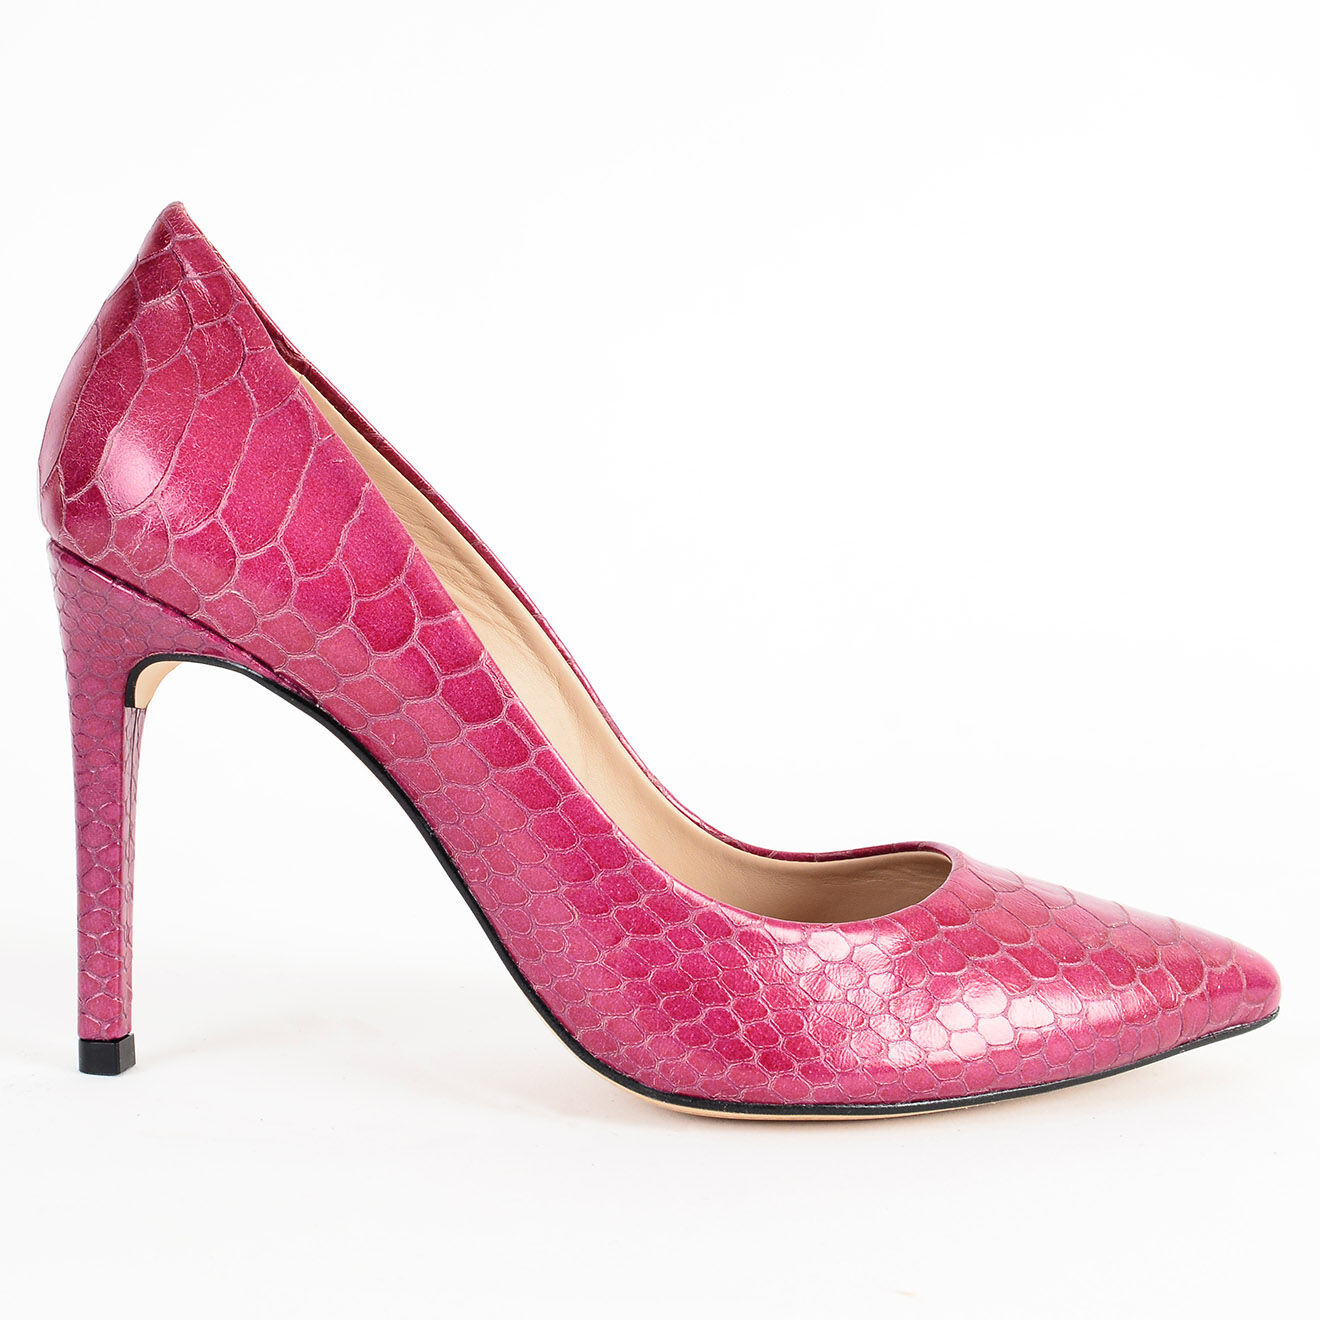 Escarpins en Cuir Serena roses - Talon 8.5 cm